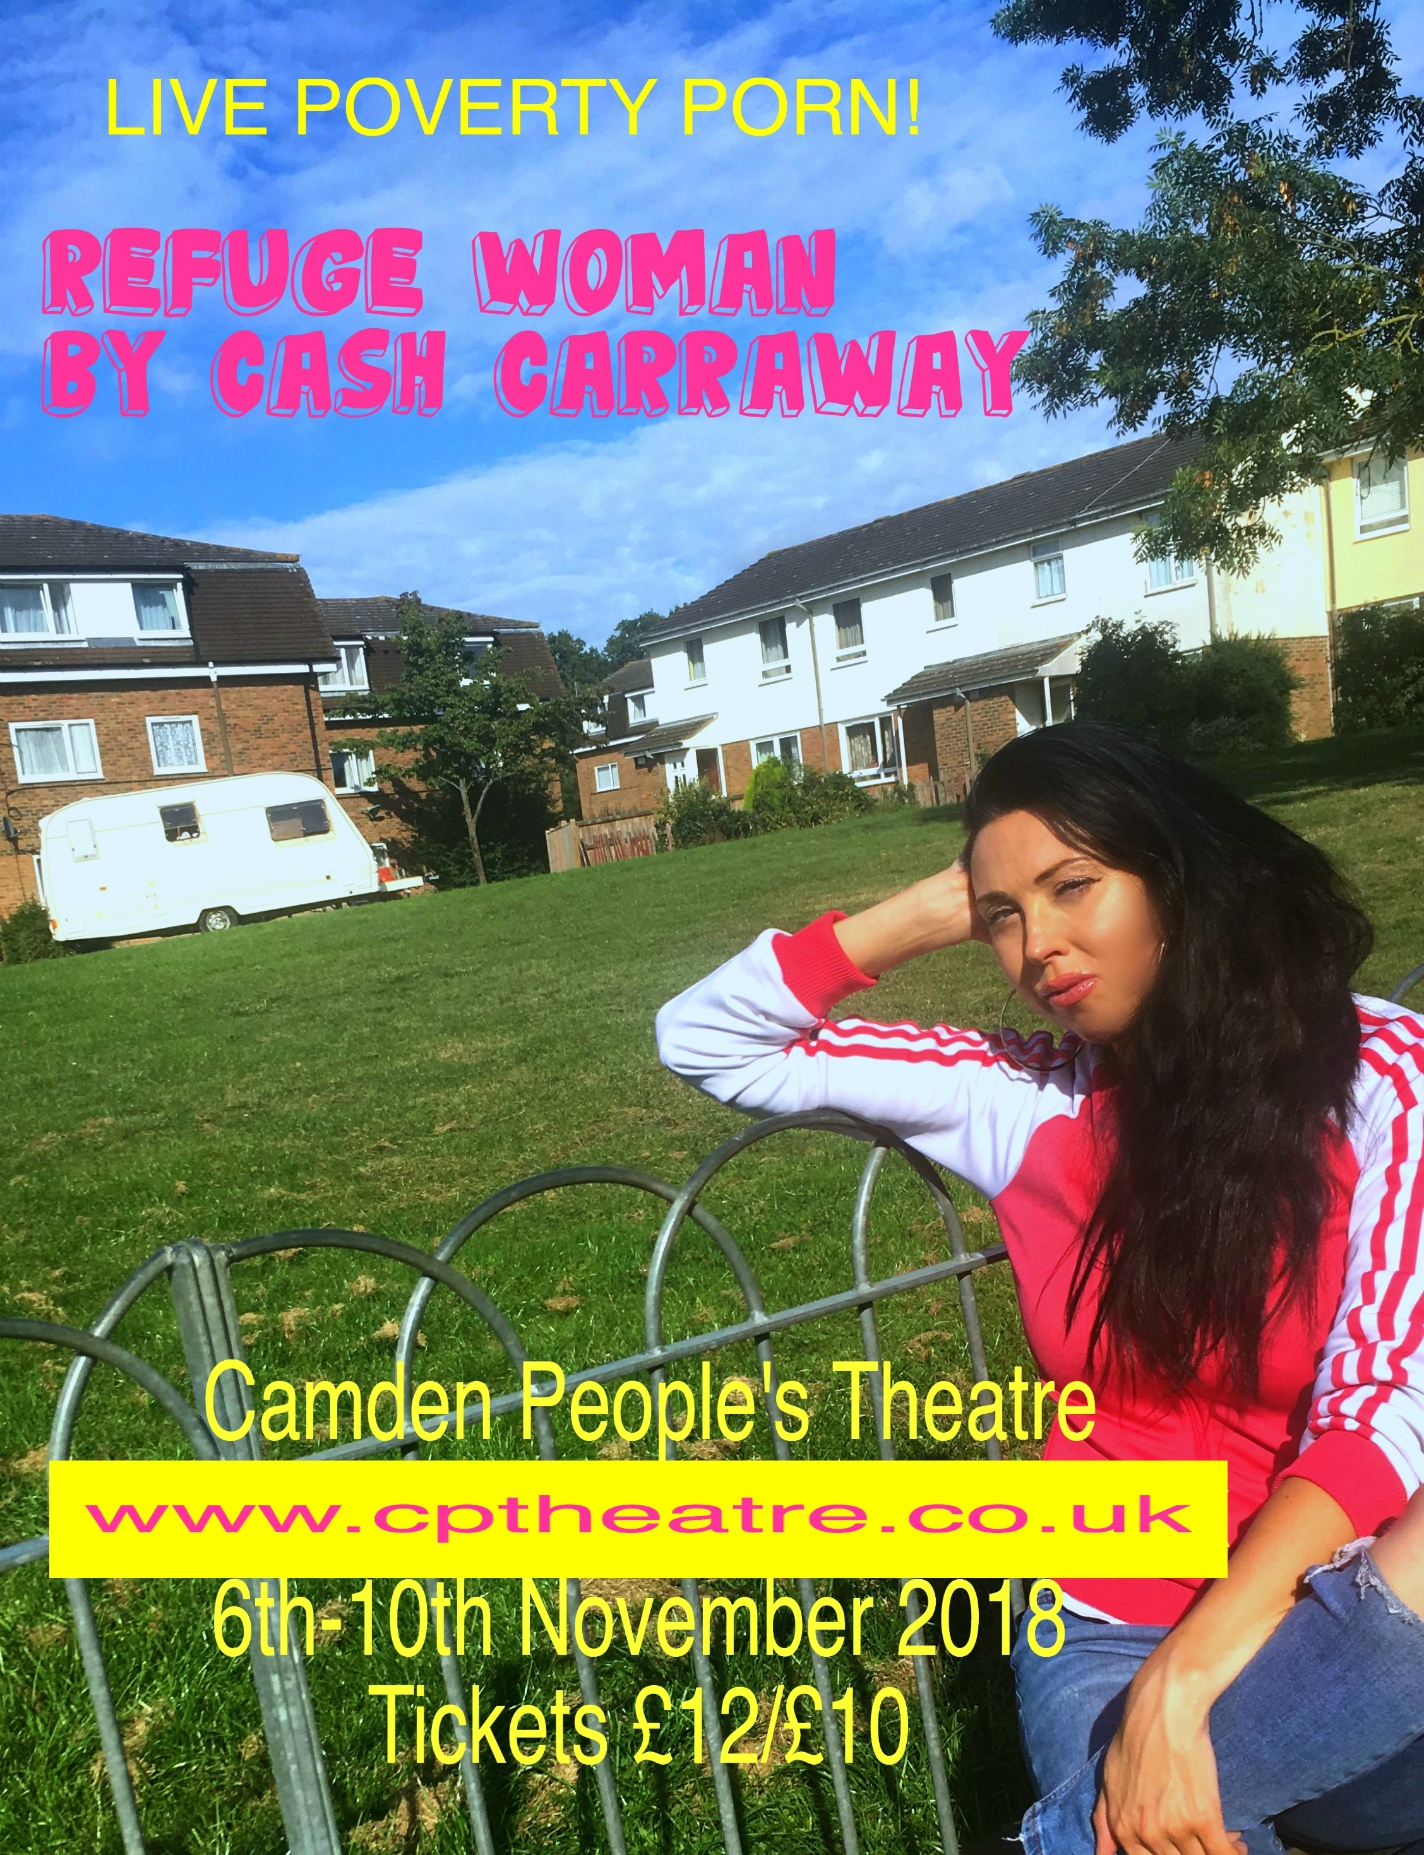 refuge-woman-cash-carraway.jpg